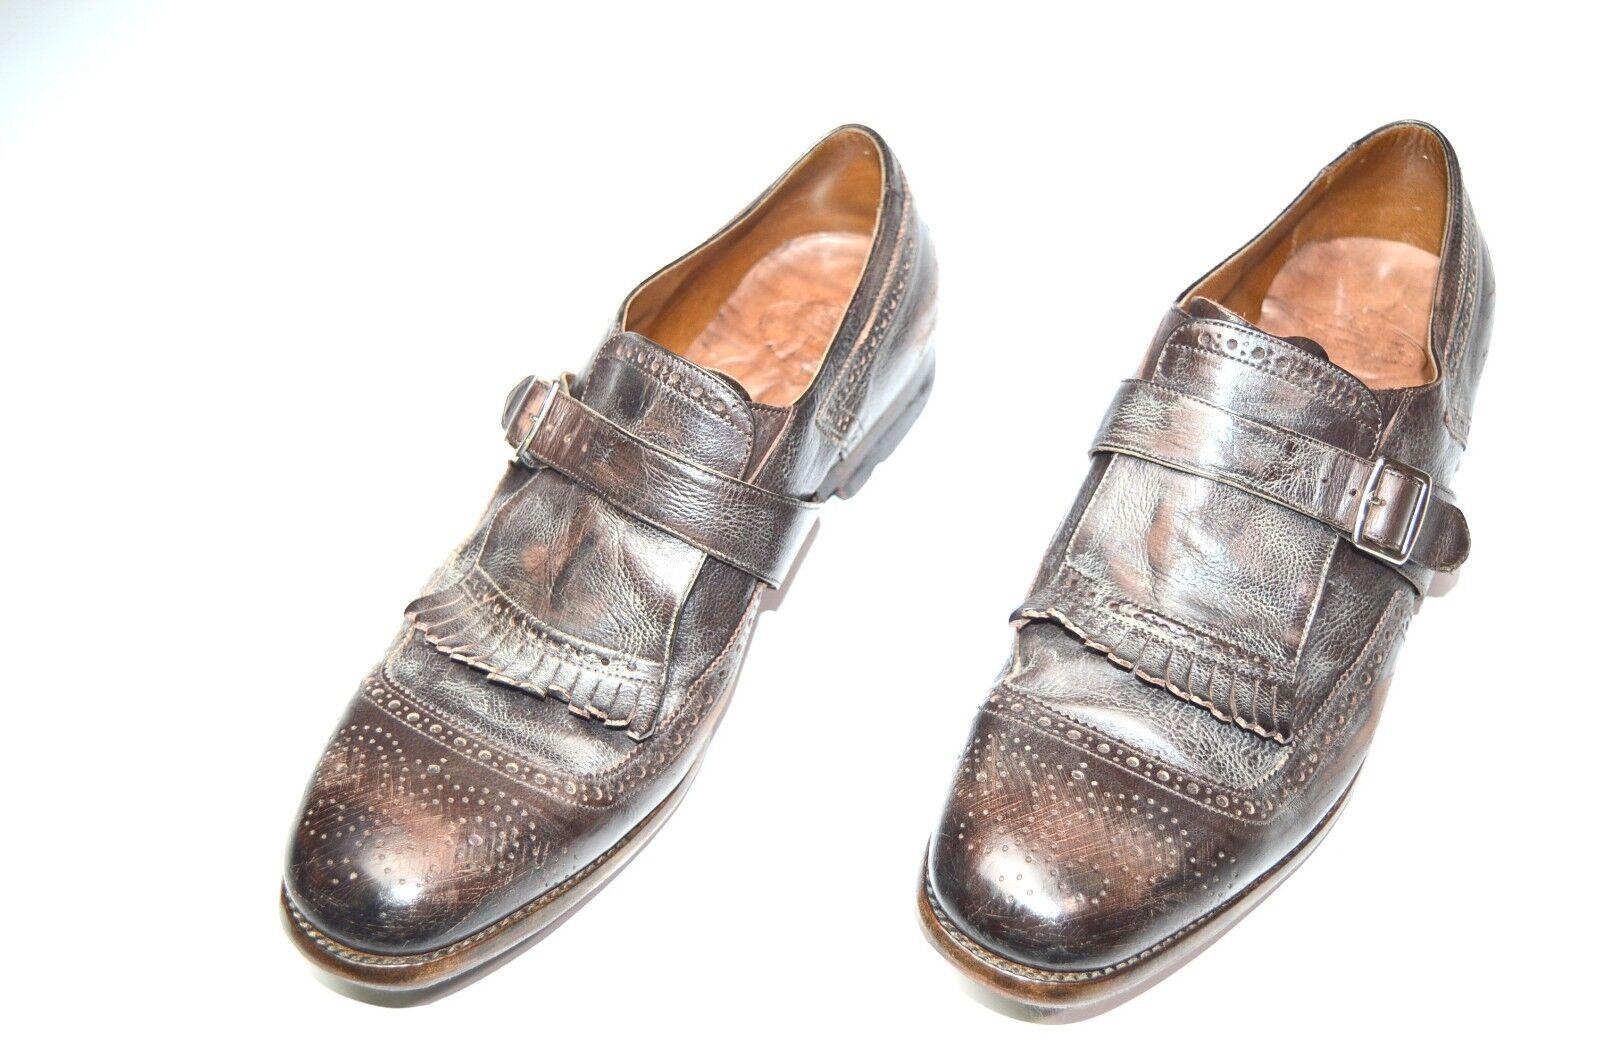 NEW CHURCH'S Dress Leather scarpe Model SHANGAY Dimensione Eu 41.5 Uk 7.5 Us 8.5 (H6)